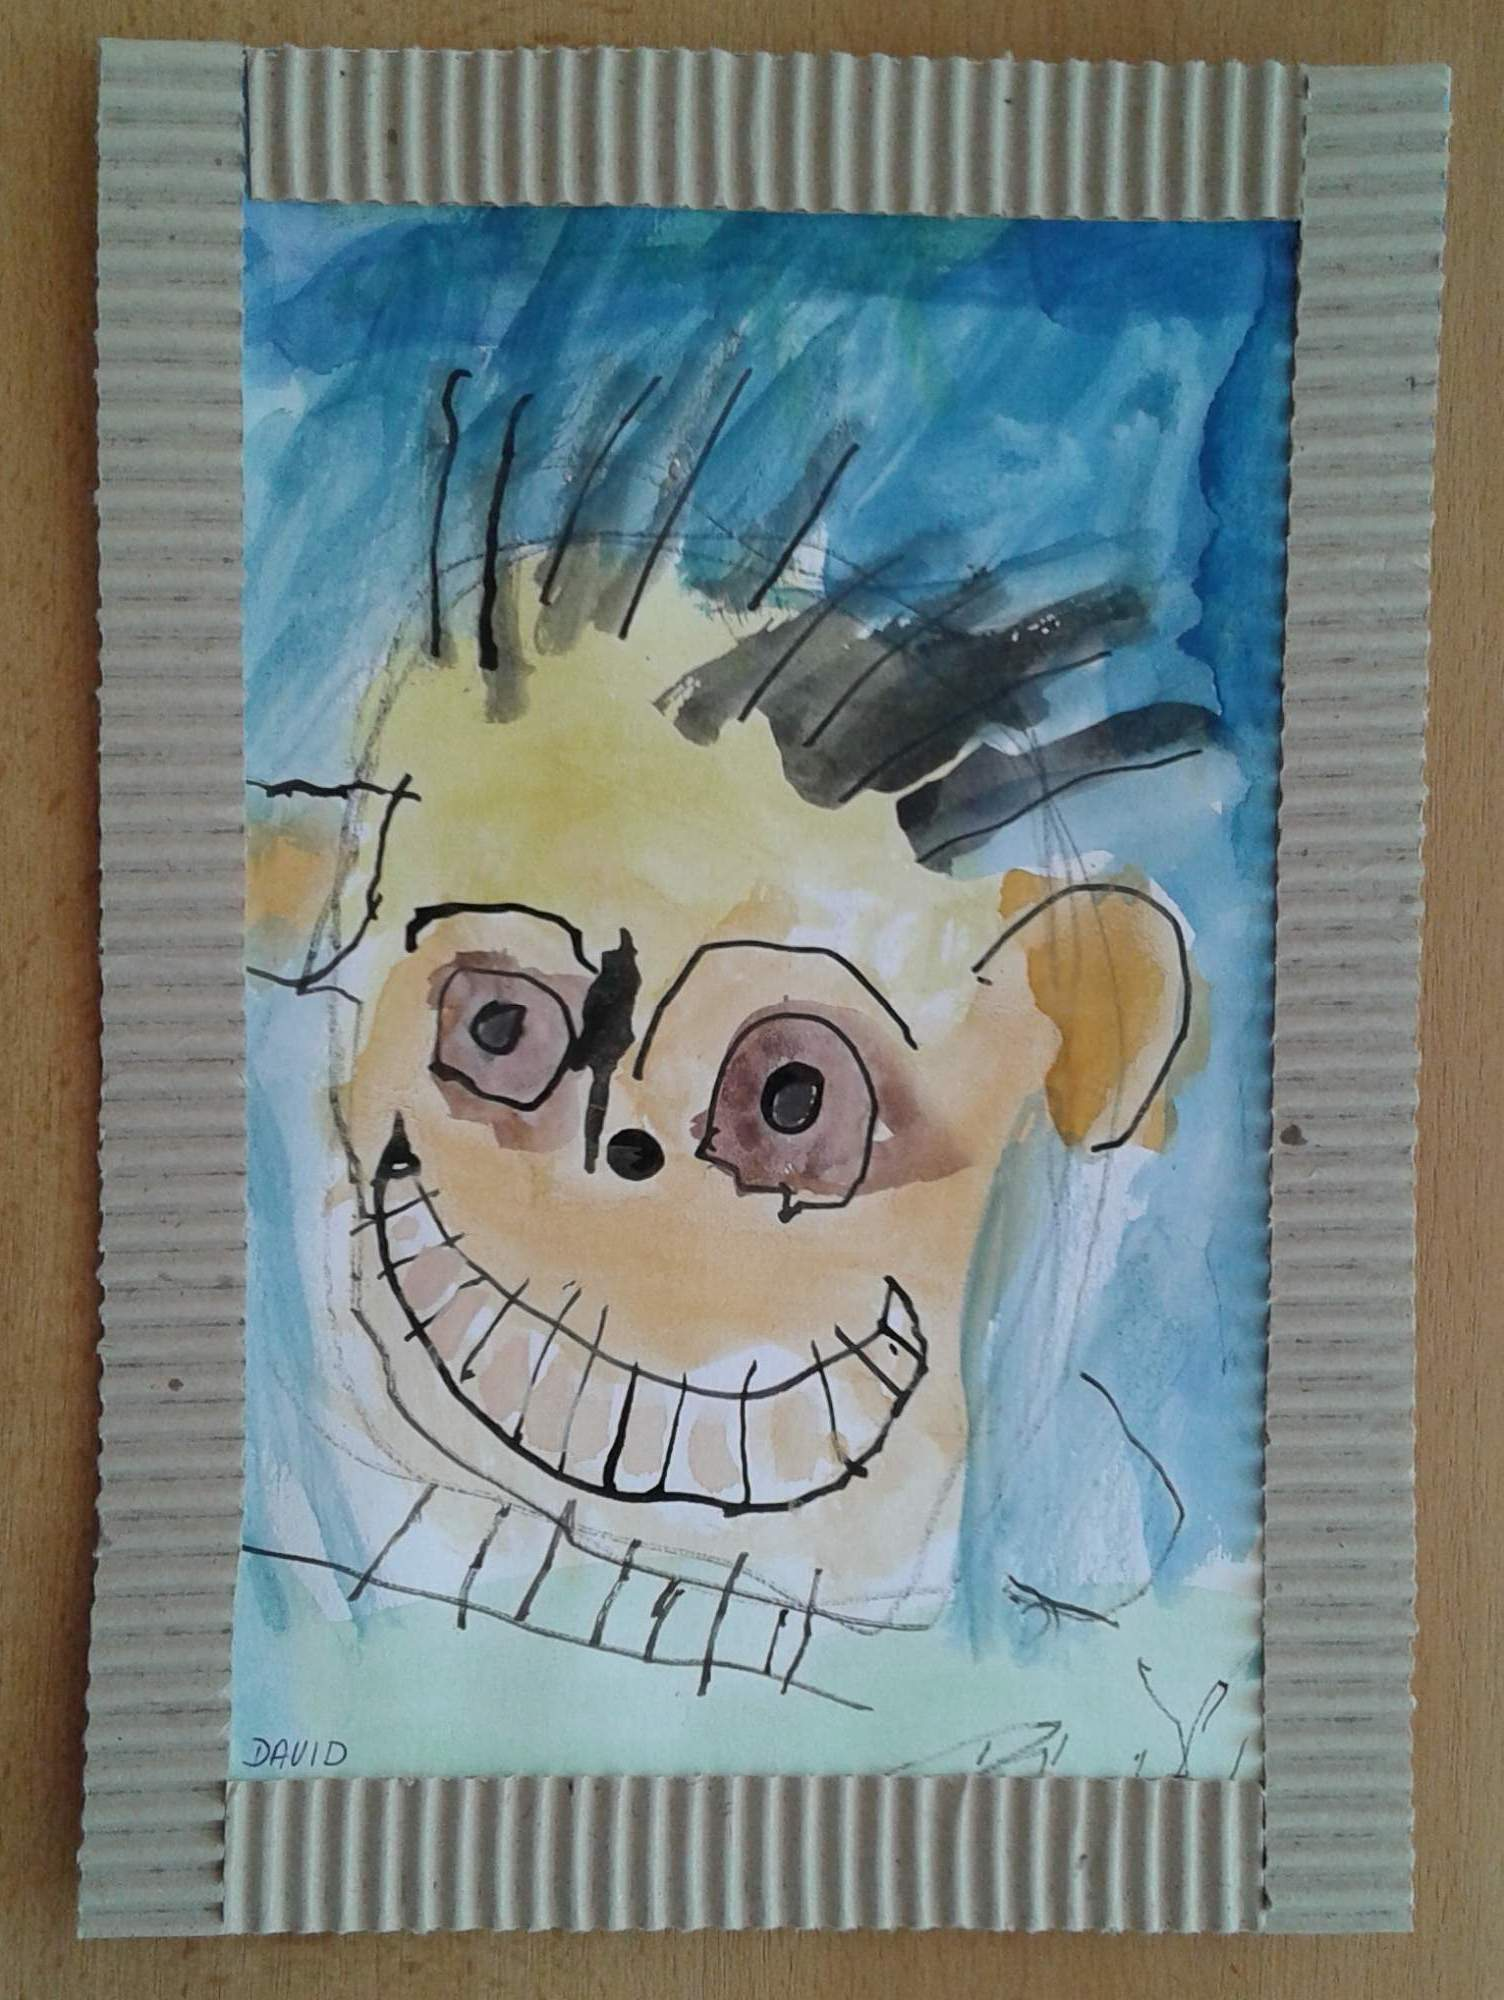 Moje Maminka Kolorovana Kresba Tusi Zabickykv Album Na Rajceti